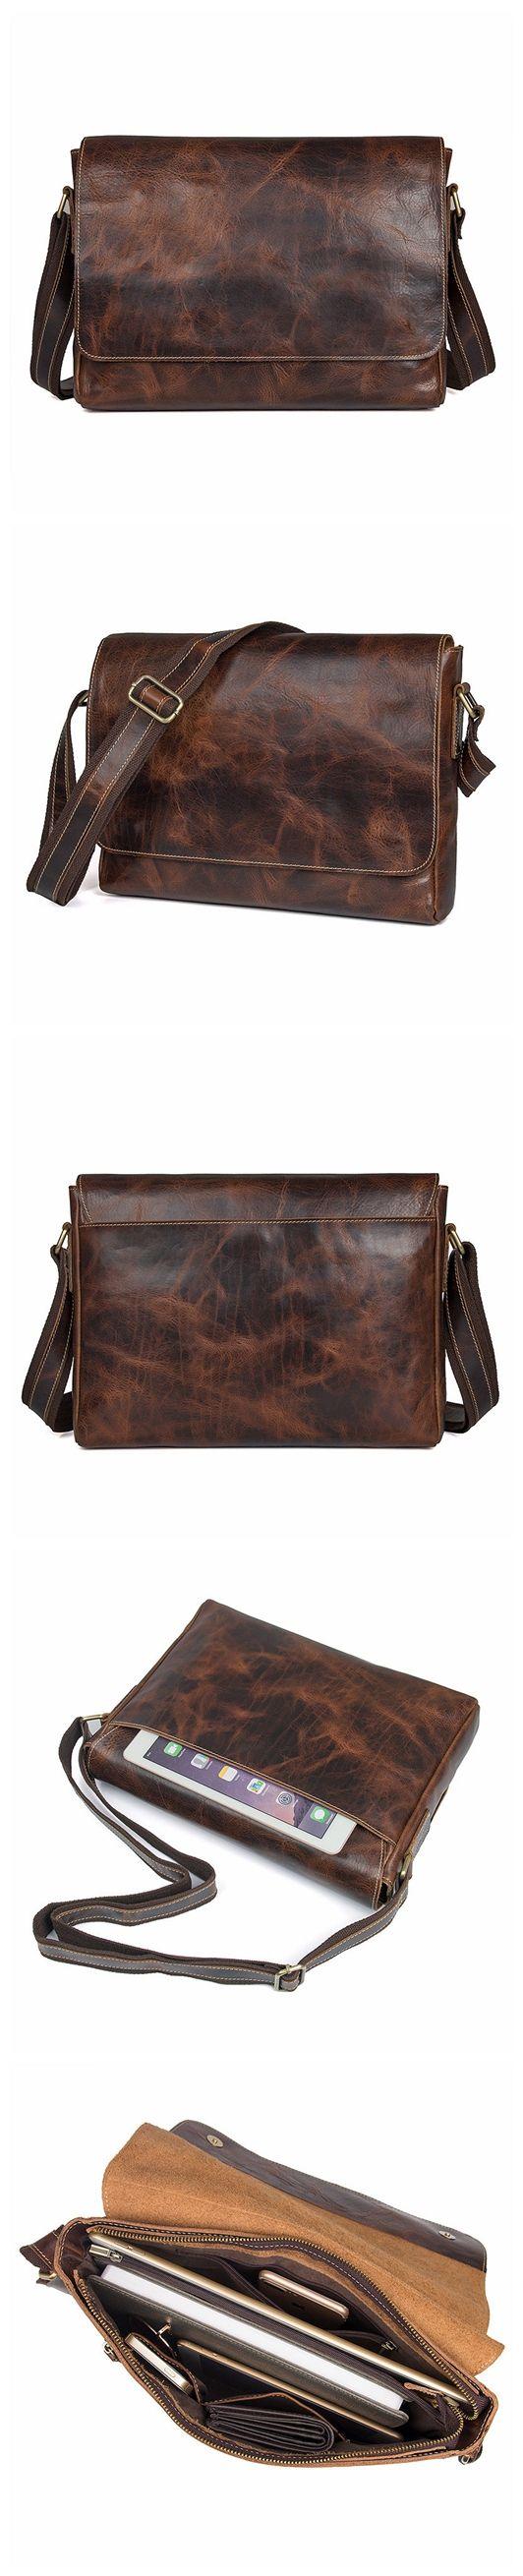 dc9e4b13aa Messenger Bag Ebay Work Messenger Bag Mens Best Mens Leather Messenger Bag  1036